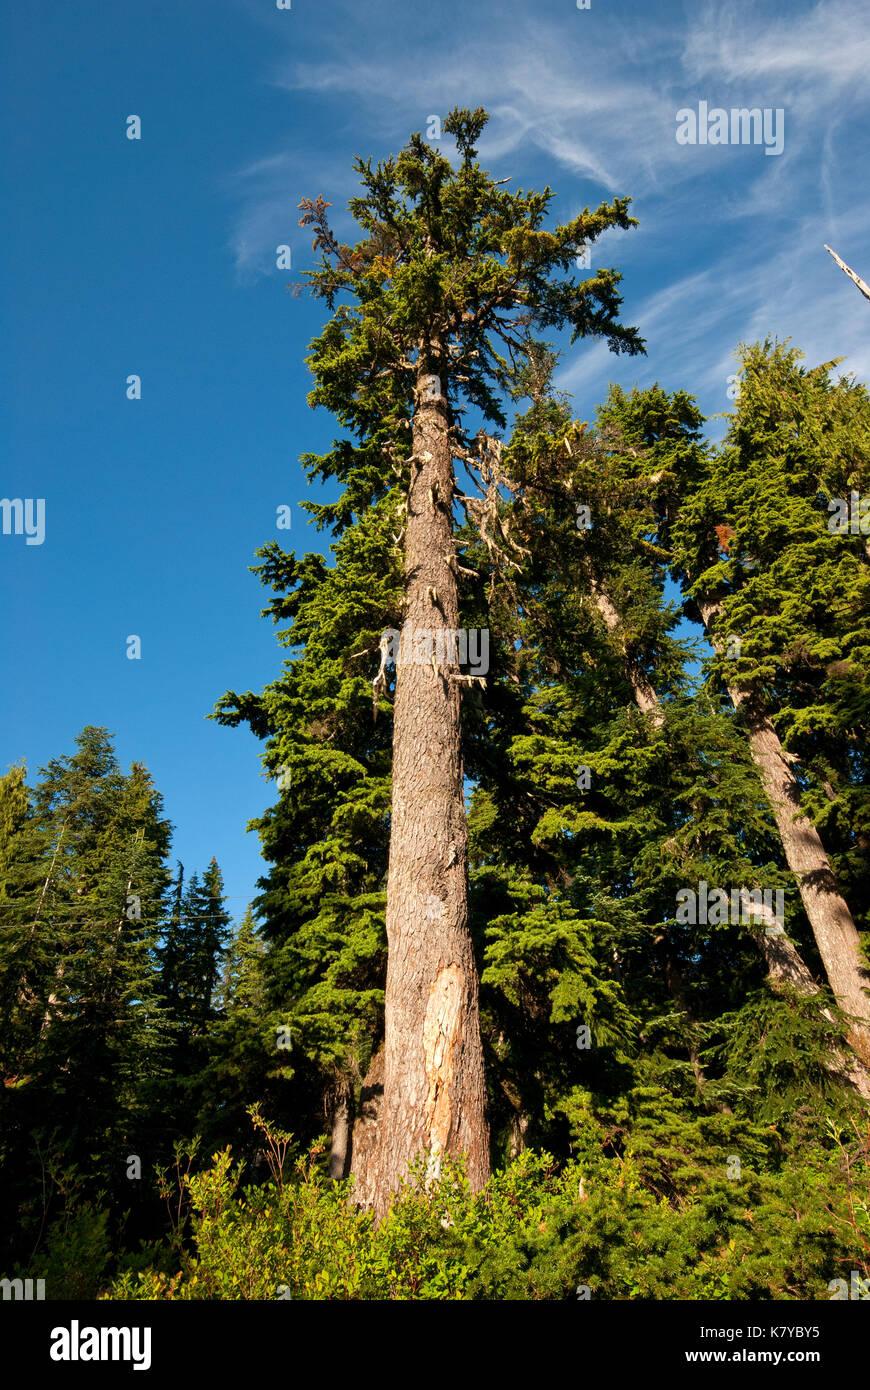 Douglas firs (Pseudotsuga menziesii) at Grouse Mountain, Vancouver, British Columbia, Canada - Stock Image